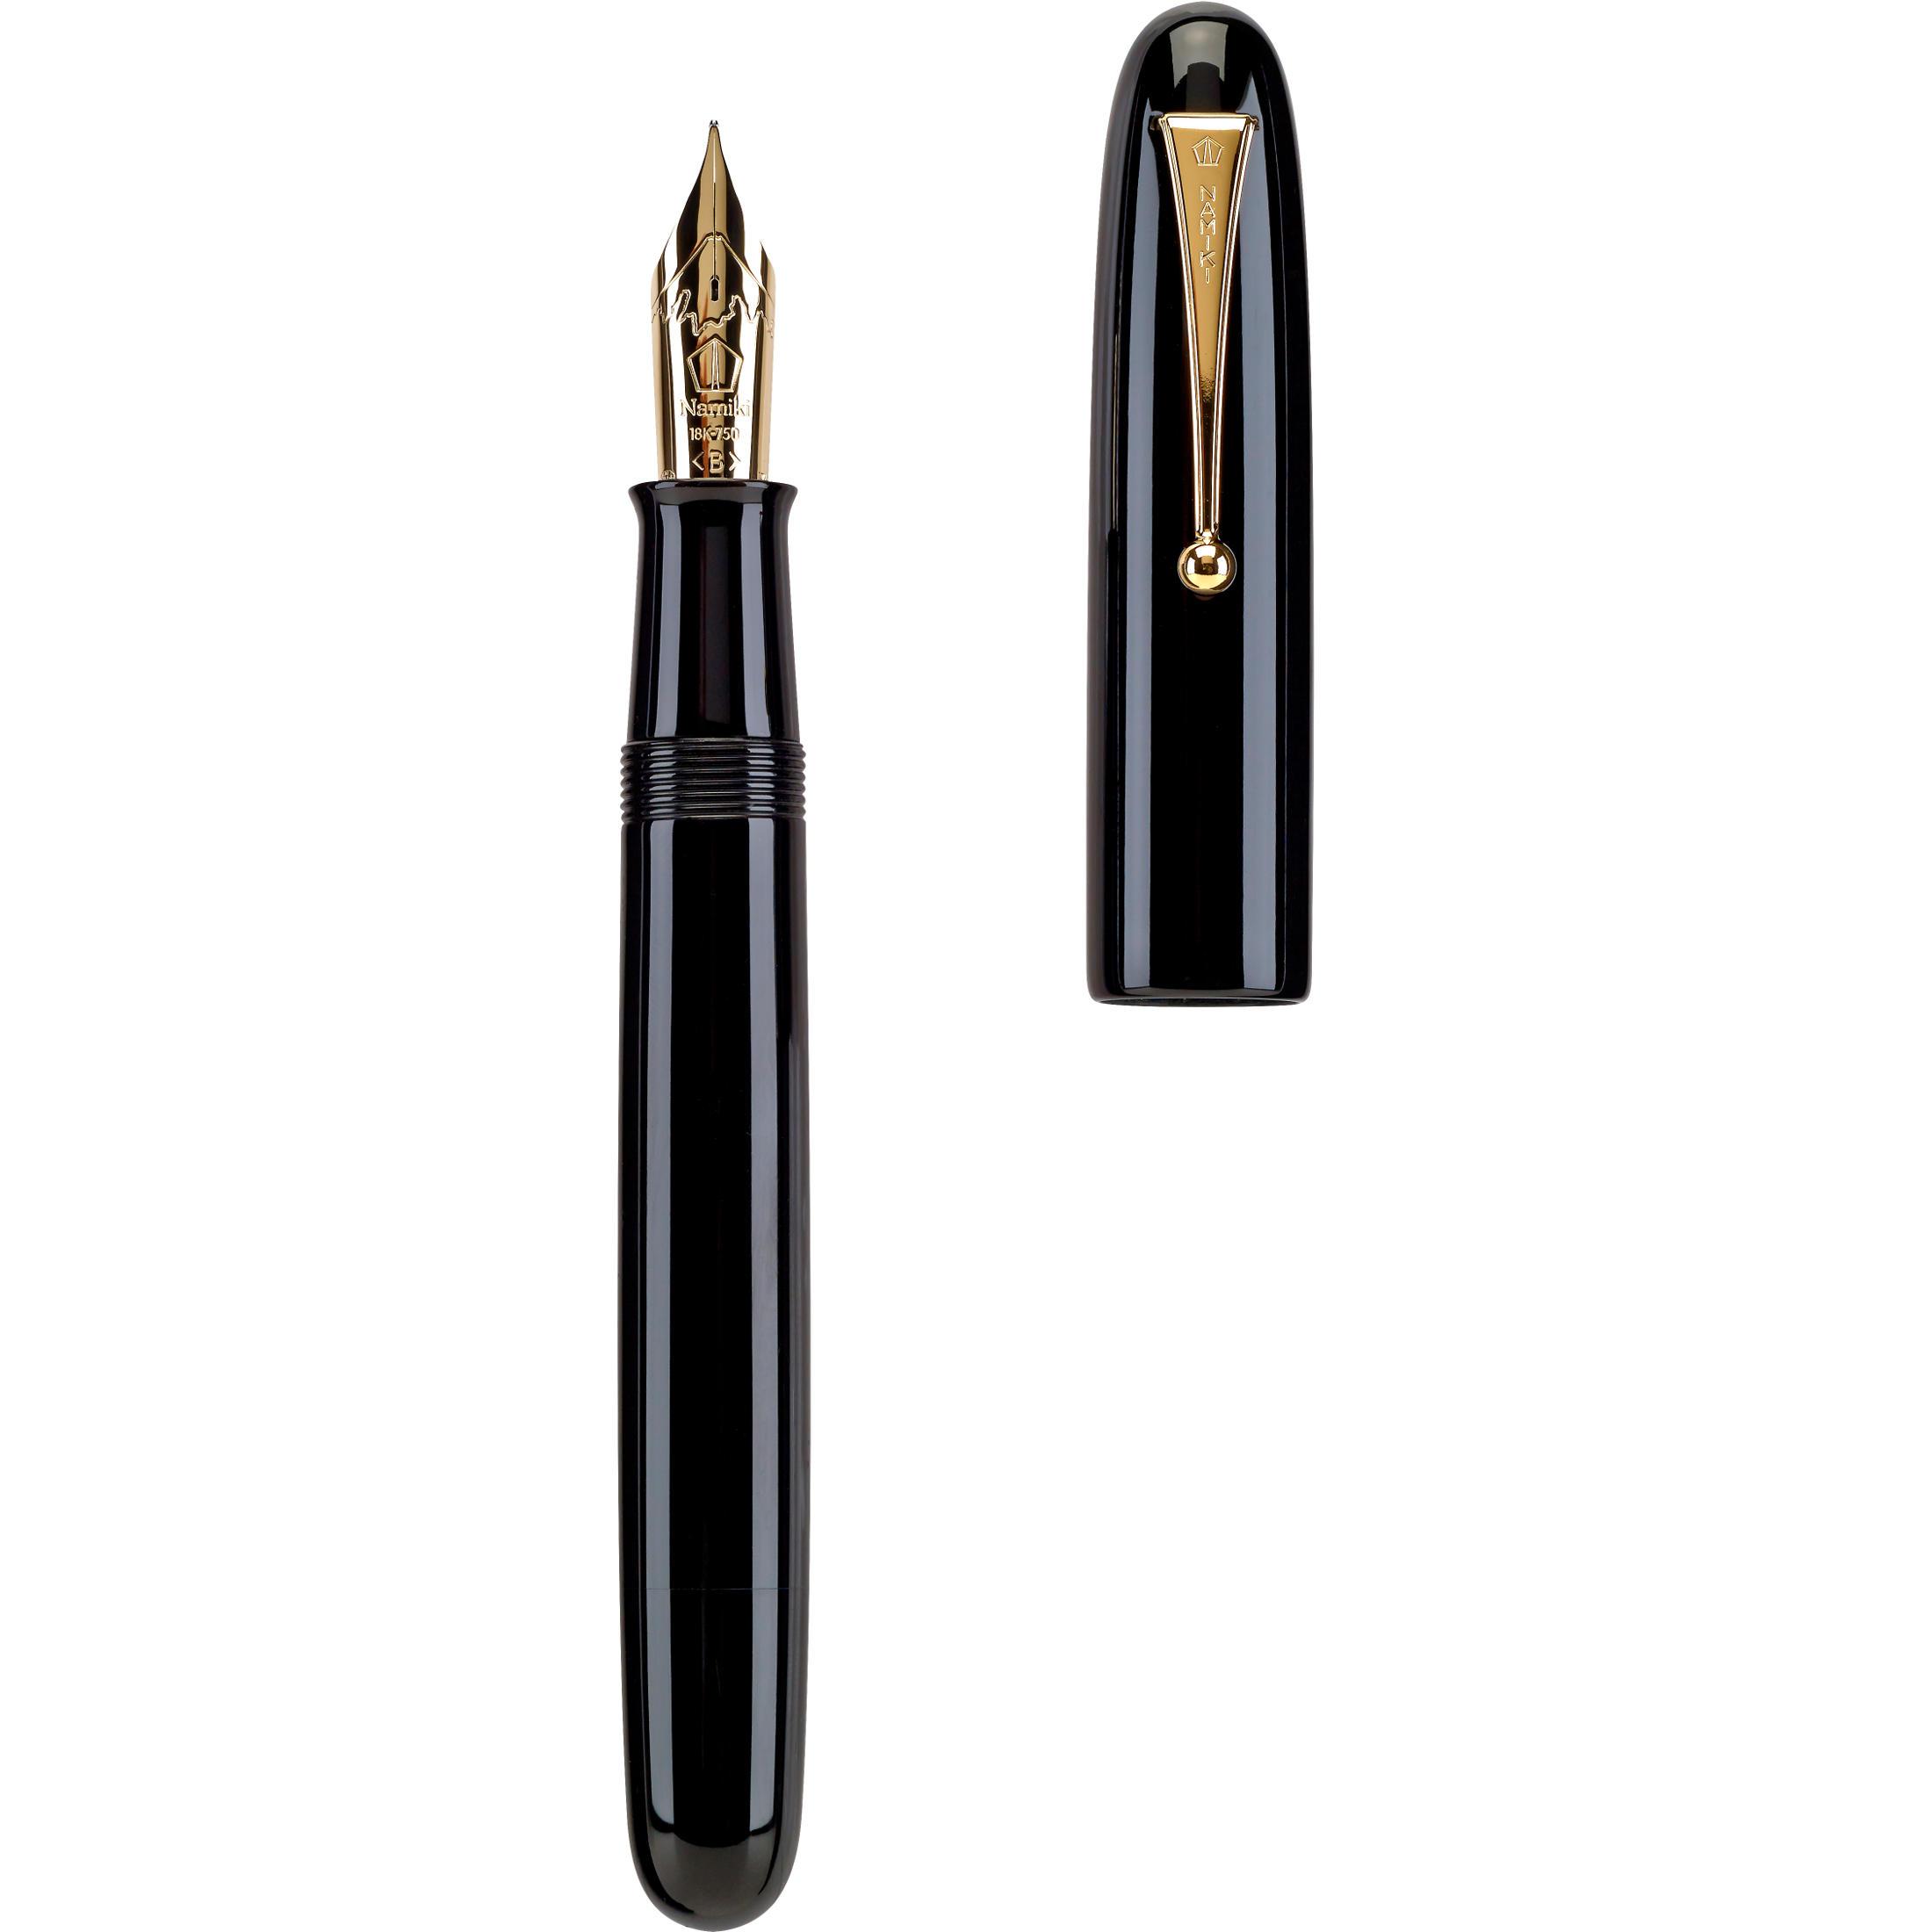 Namiki_Emperor_Black_Urushi_fountain_pen_uncapped